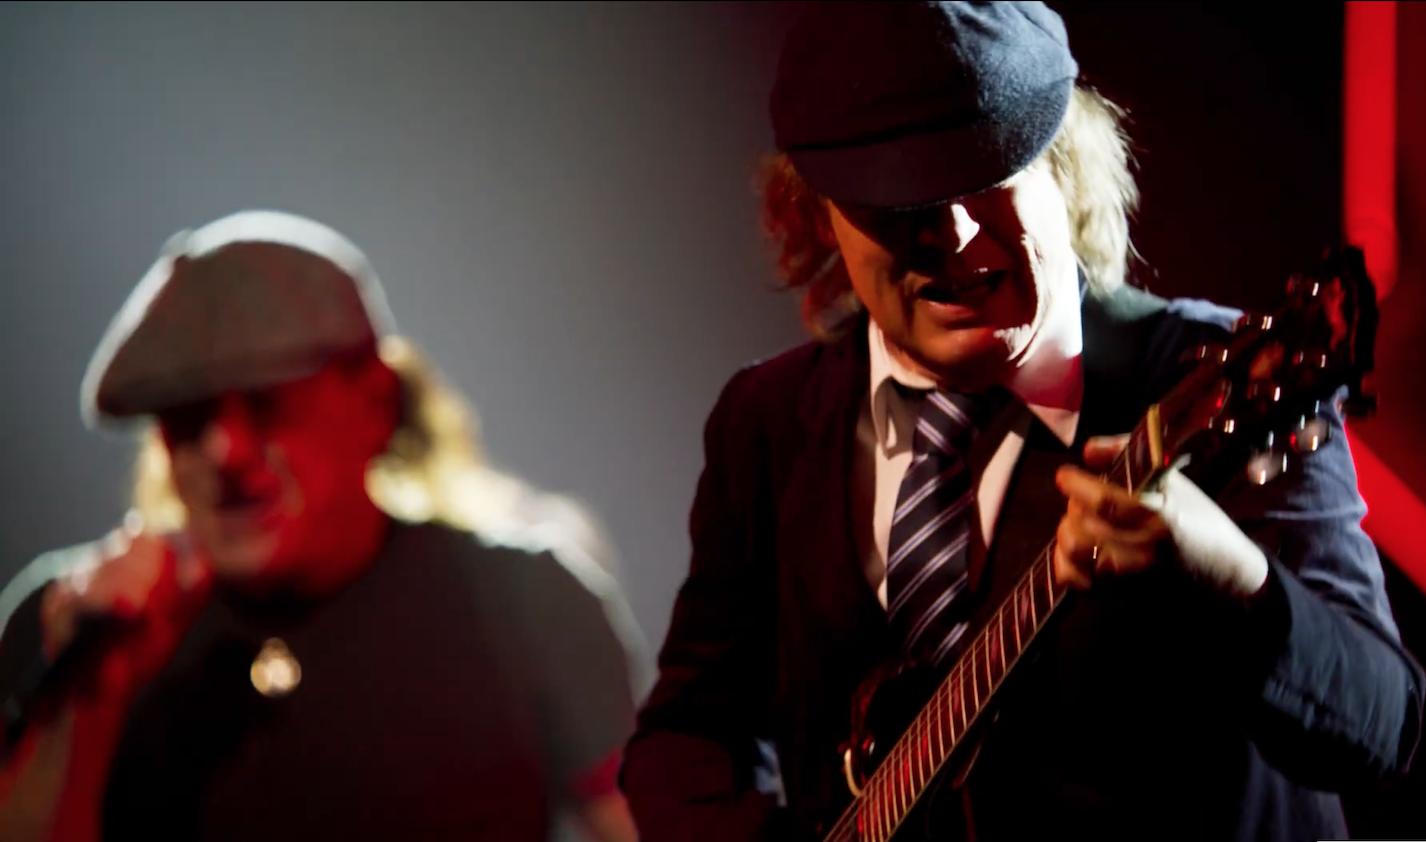 Nový klip od AC/DC! Shot In The Dark září do ruda